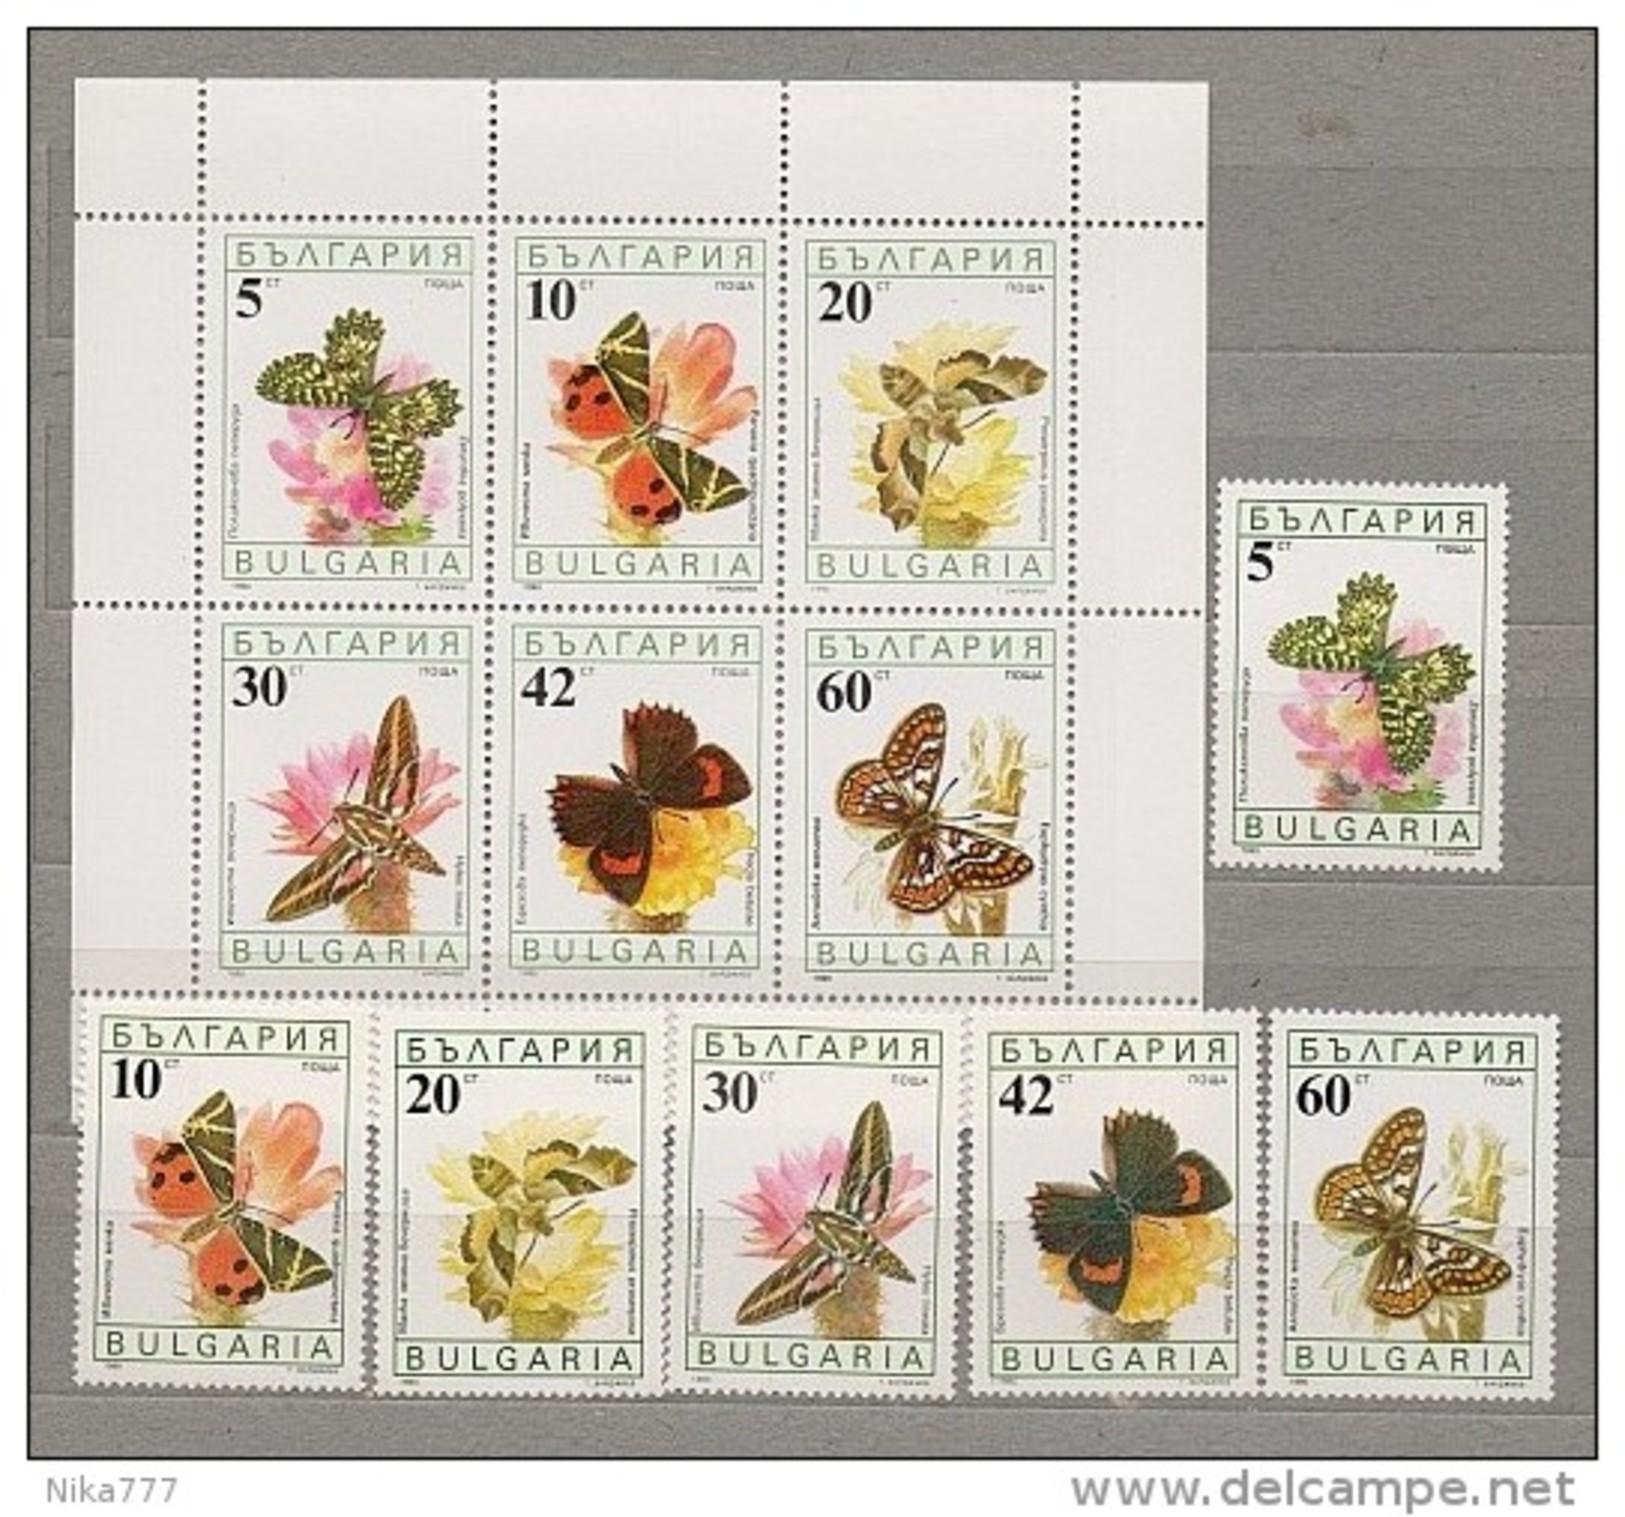 Bulgaria Mint (**) 1990 Set Stamp Block BF Fauna Butterfly Entomology Insect 6.70 EU - Ongebruikt